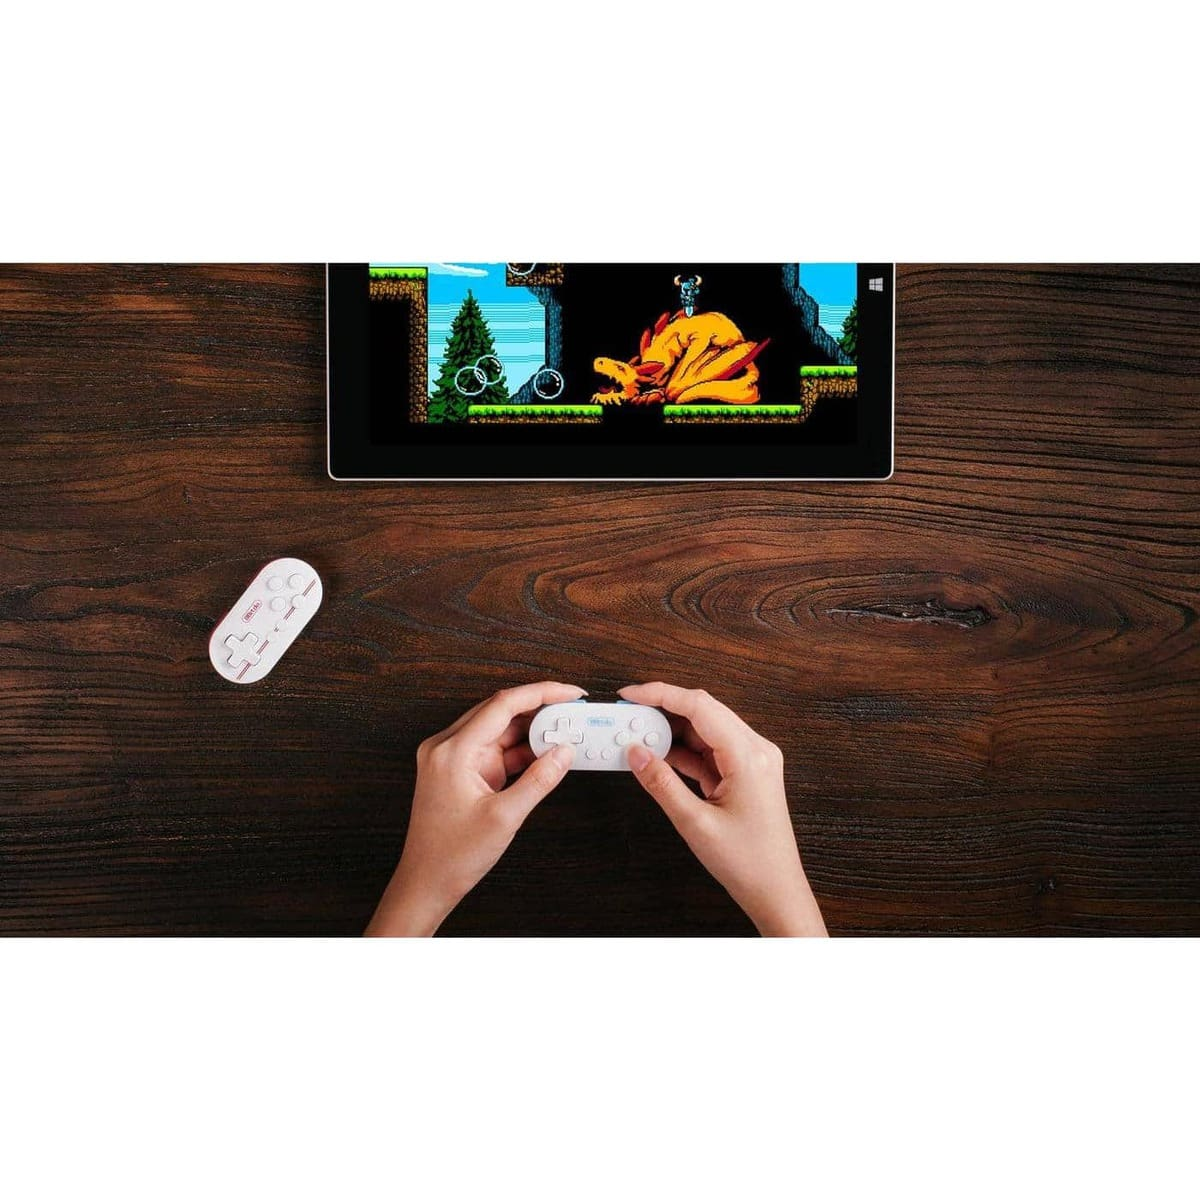 8bitdo FC Zero Mini Gamepad - Verdens mindste Bluetooth Controller